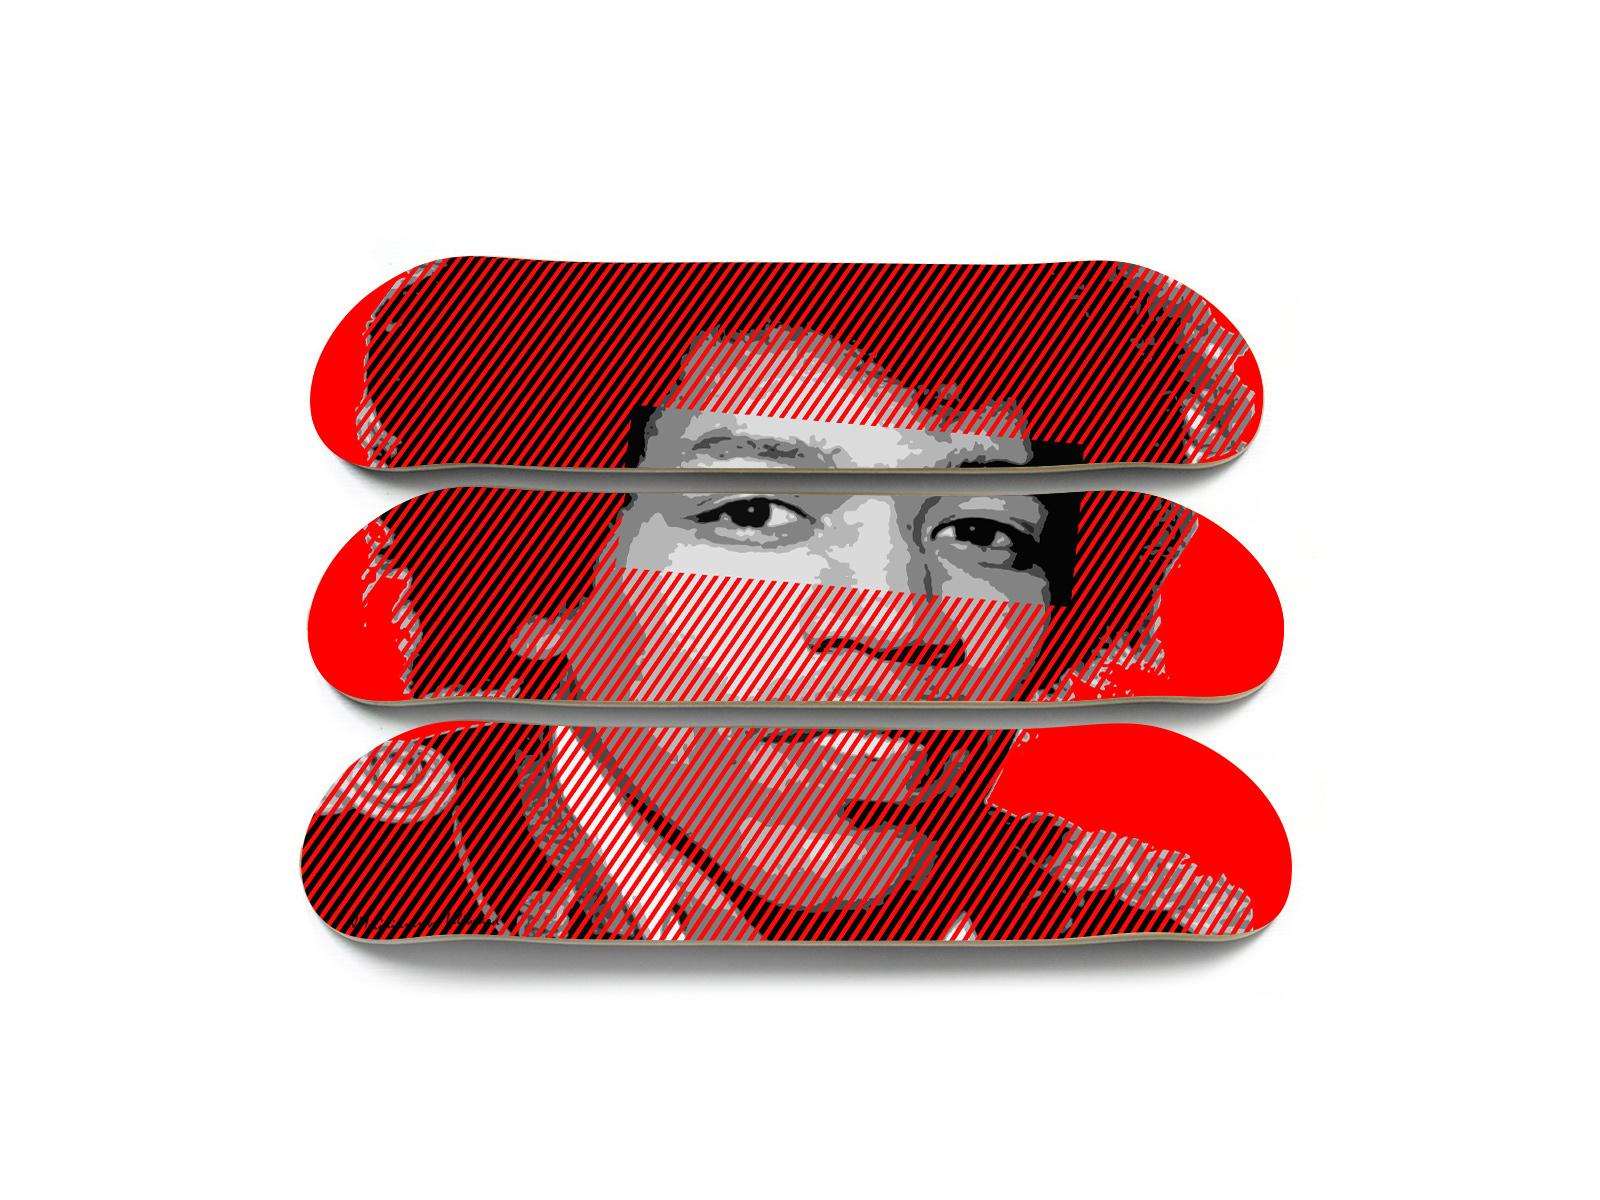 Jimmy-Hendrix JM-Gnidzaz